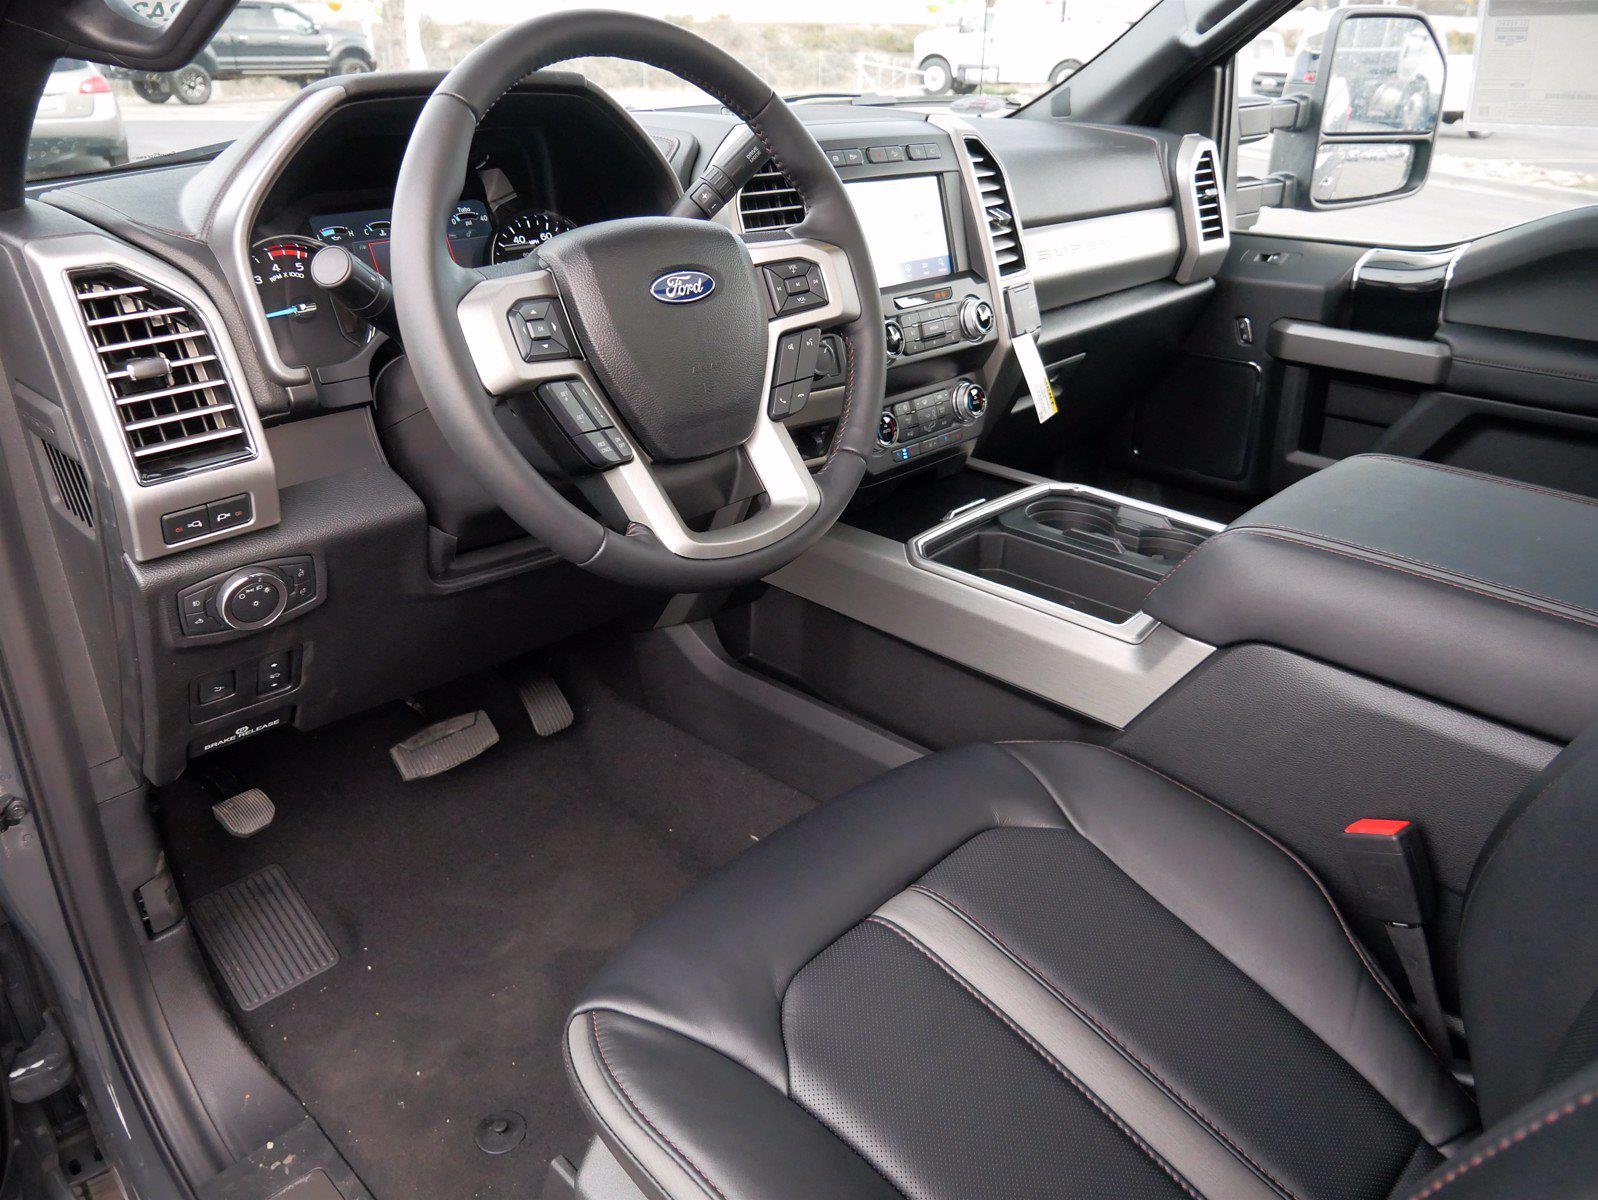 2021 Ford F-350 Crew Cab 4x4, Pickup #24347 - photo 12